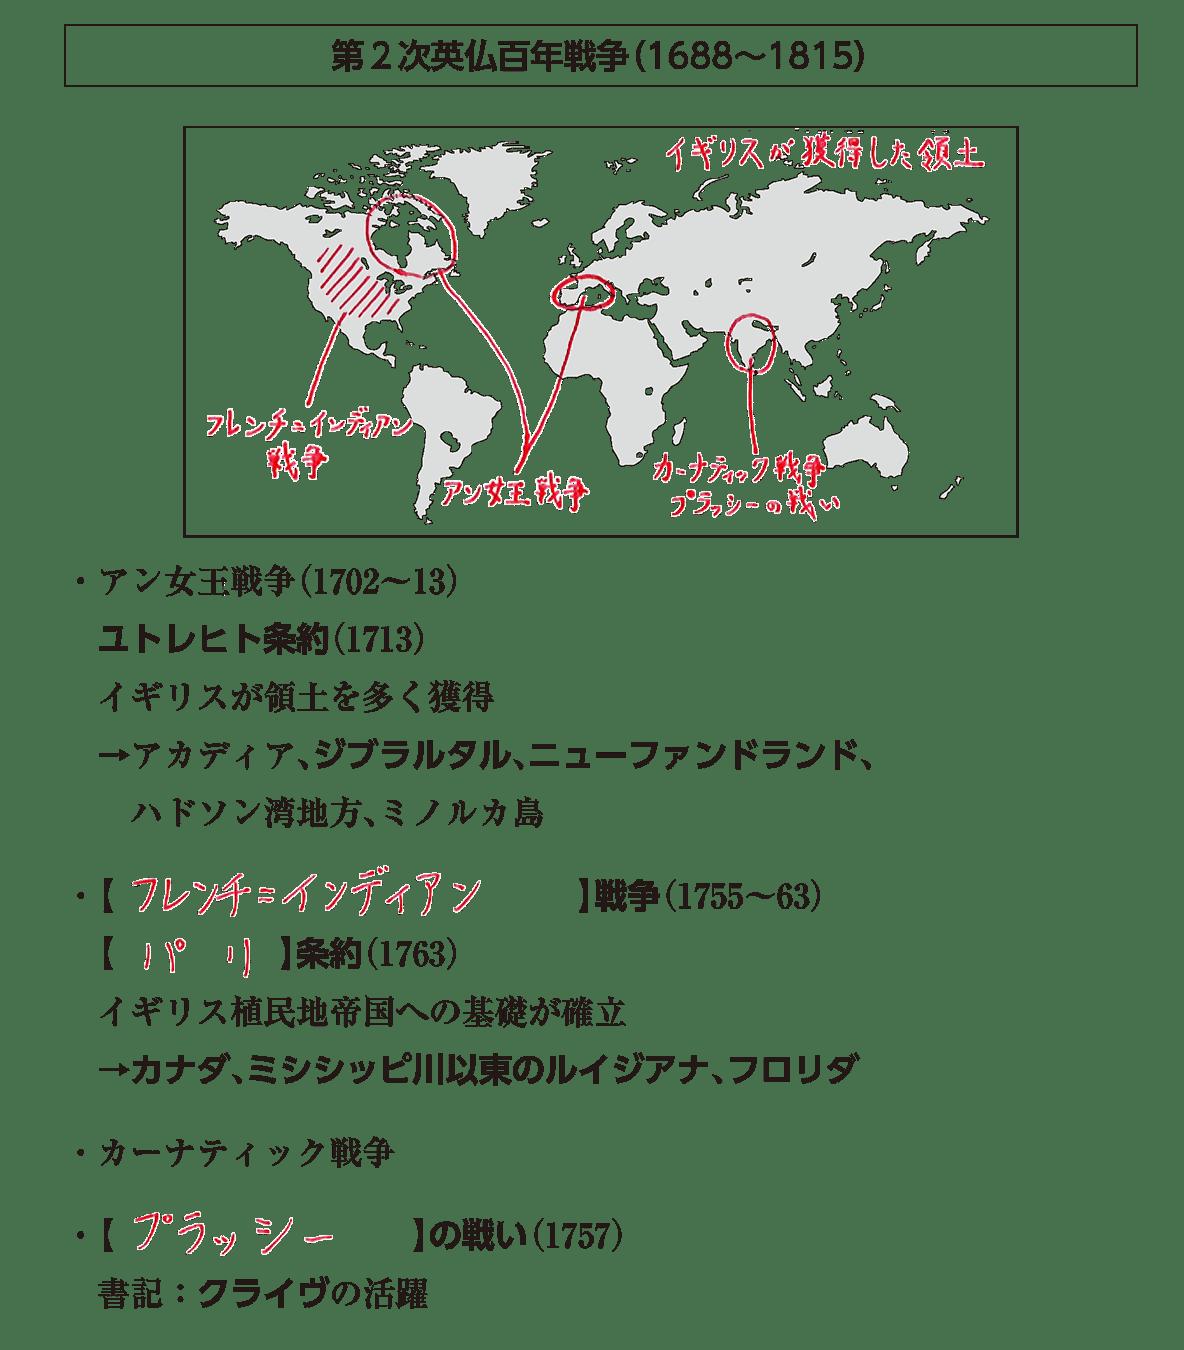 高校世界史 主権国家体制と西欧絶対王政5 ポイント3 答え全部